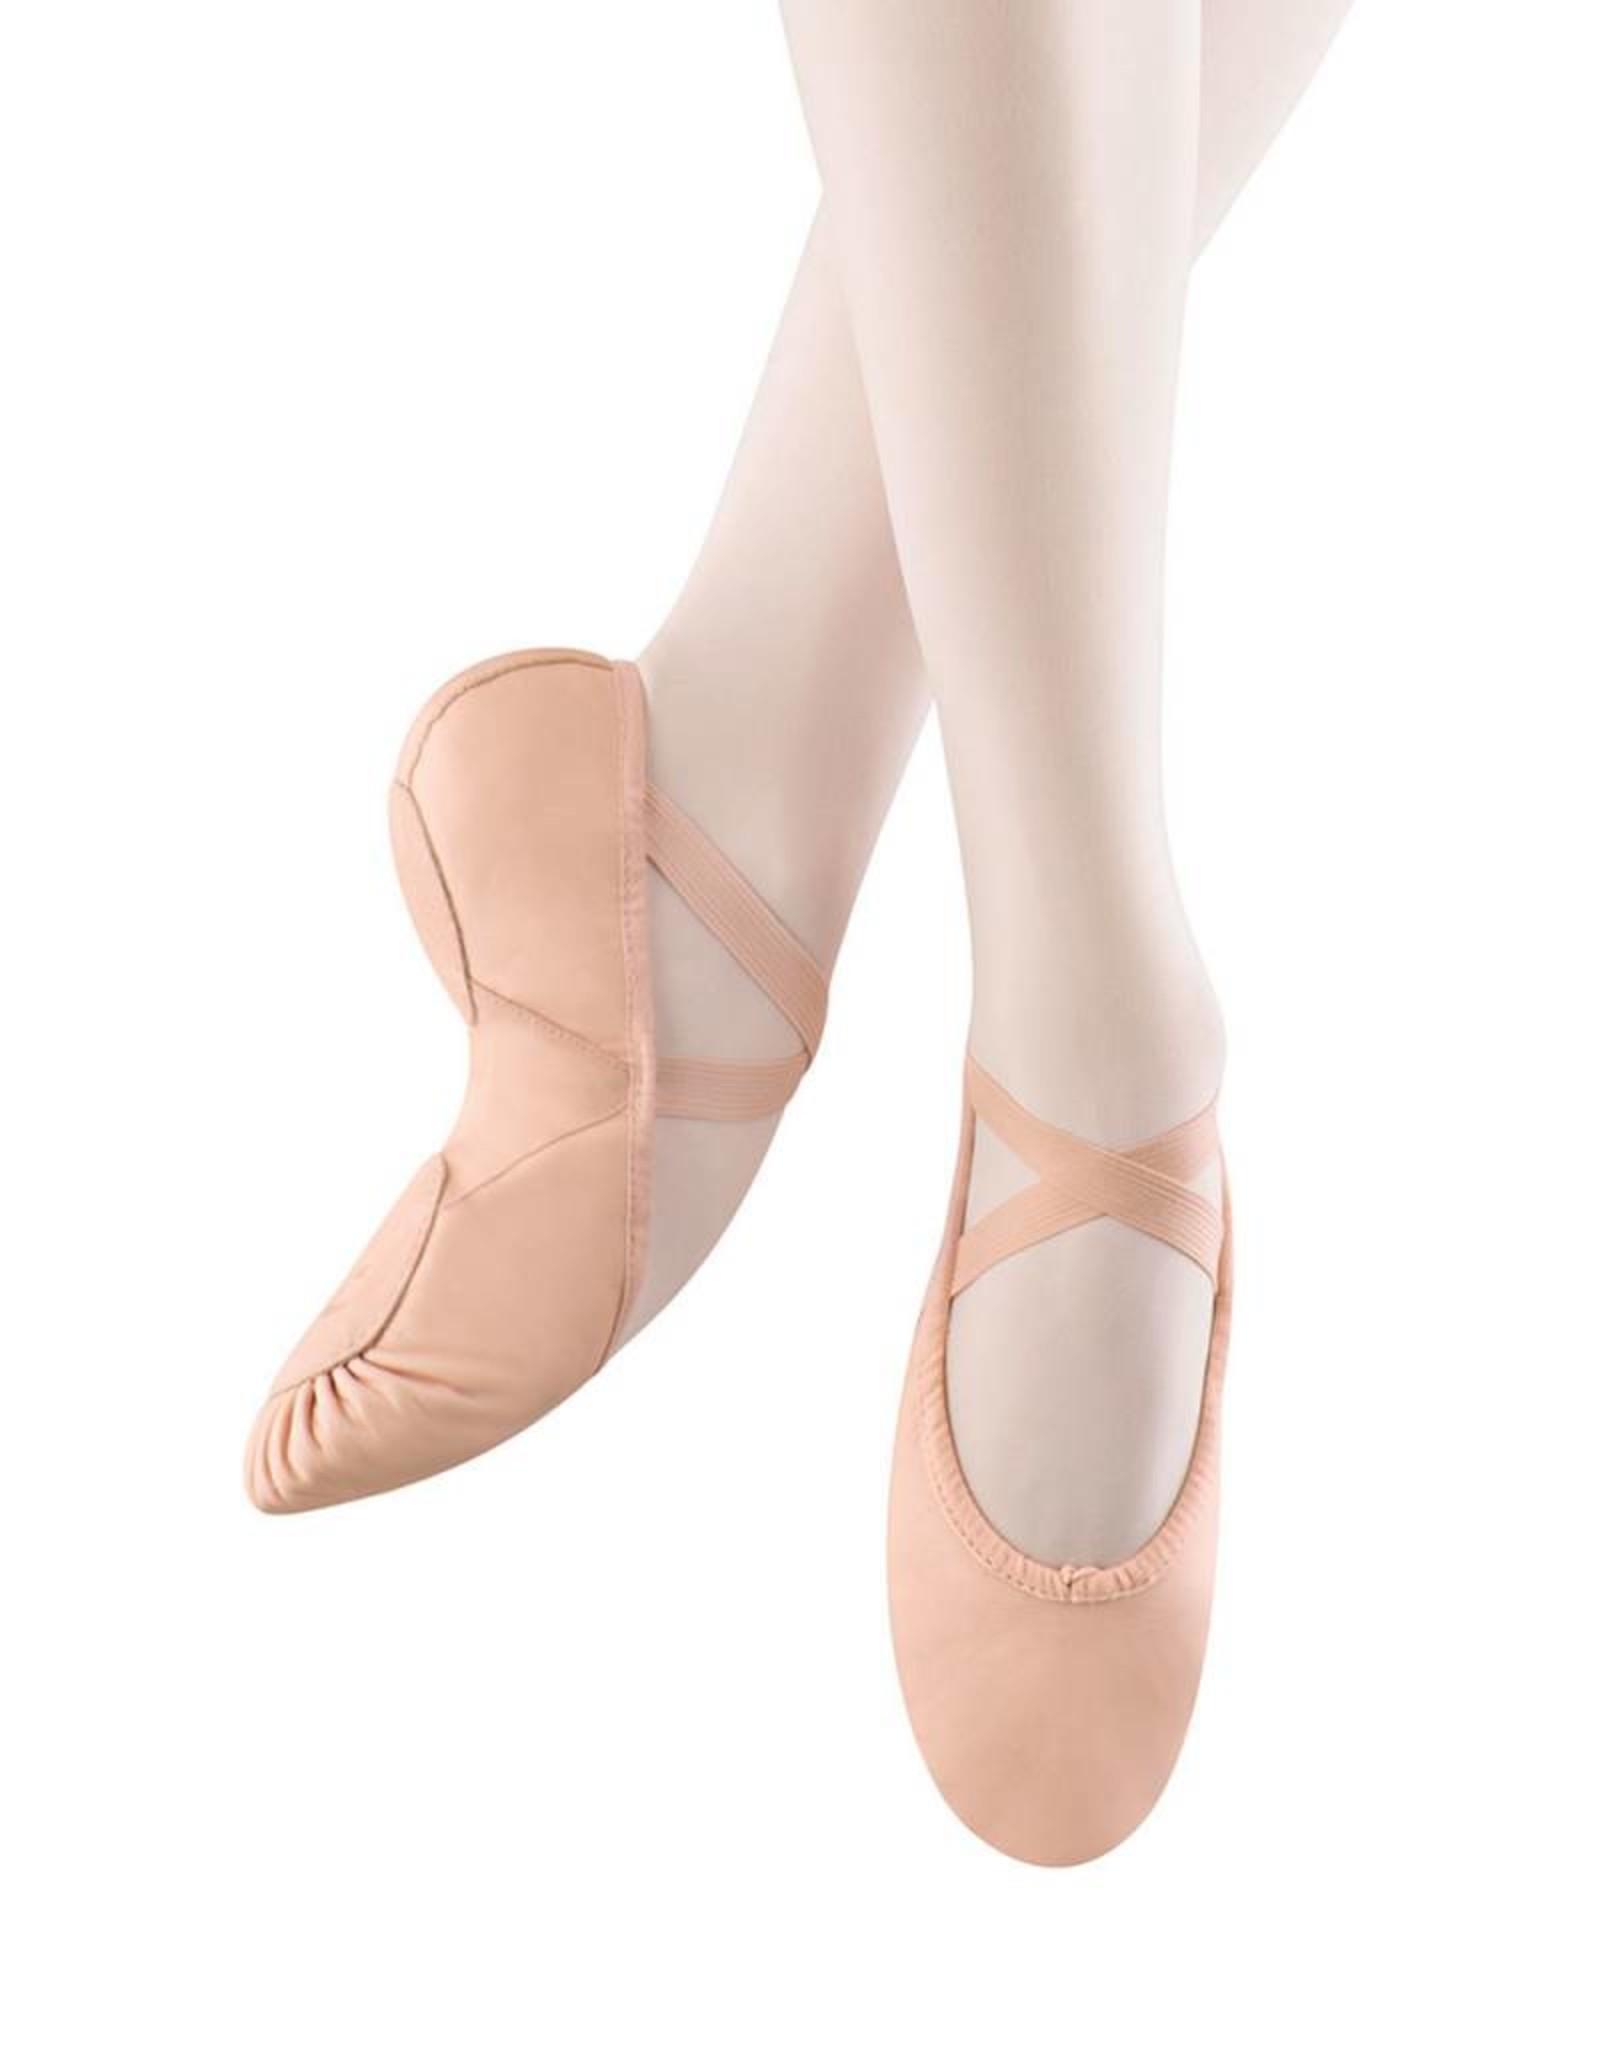 Bloch Bloch Prolite II Hybrid Pink Ballet Slipper